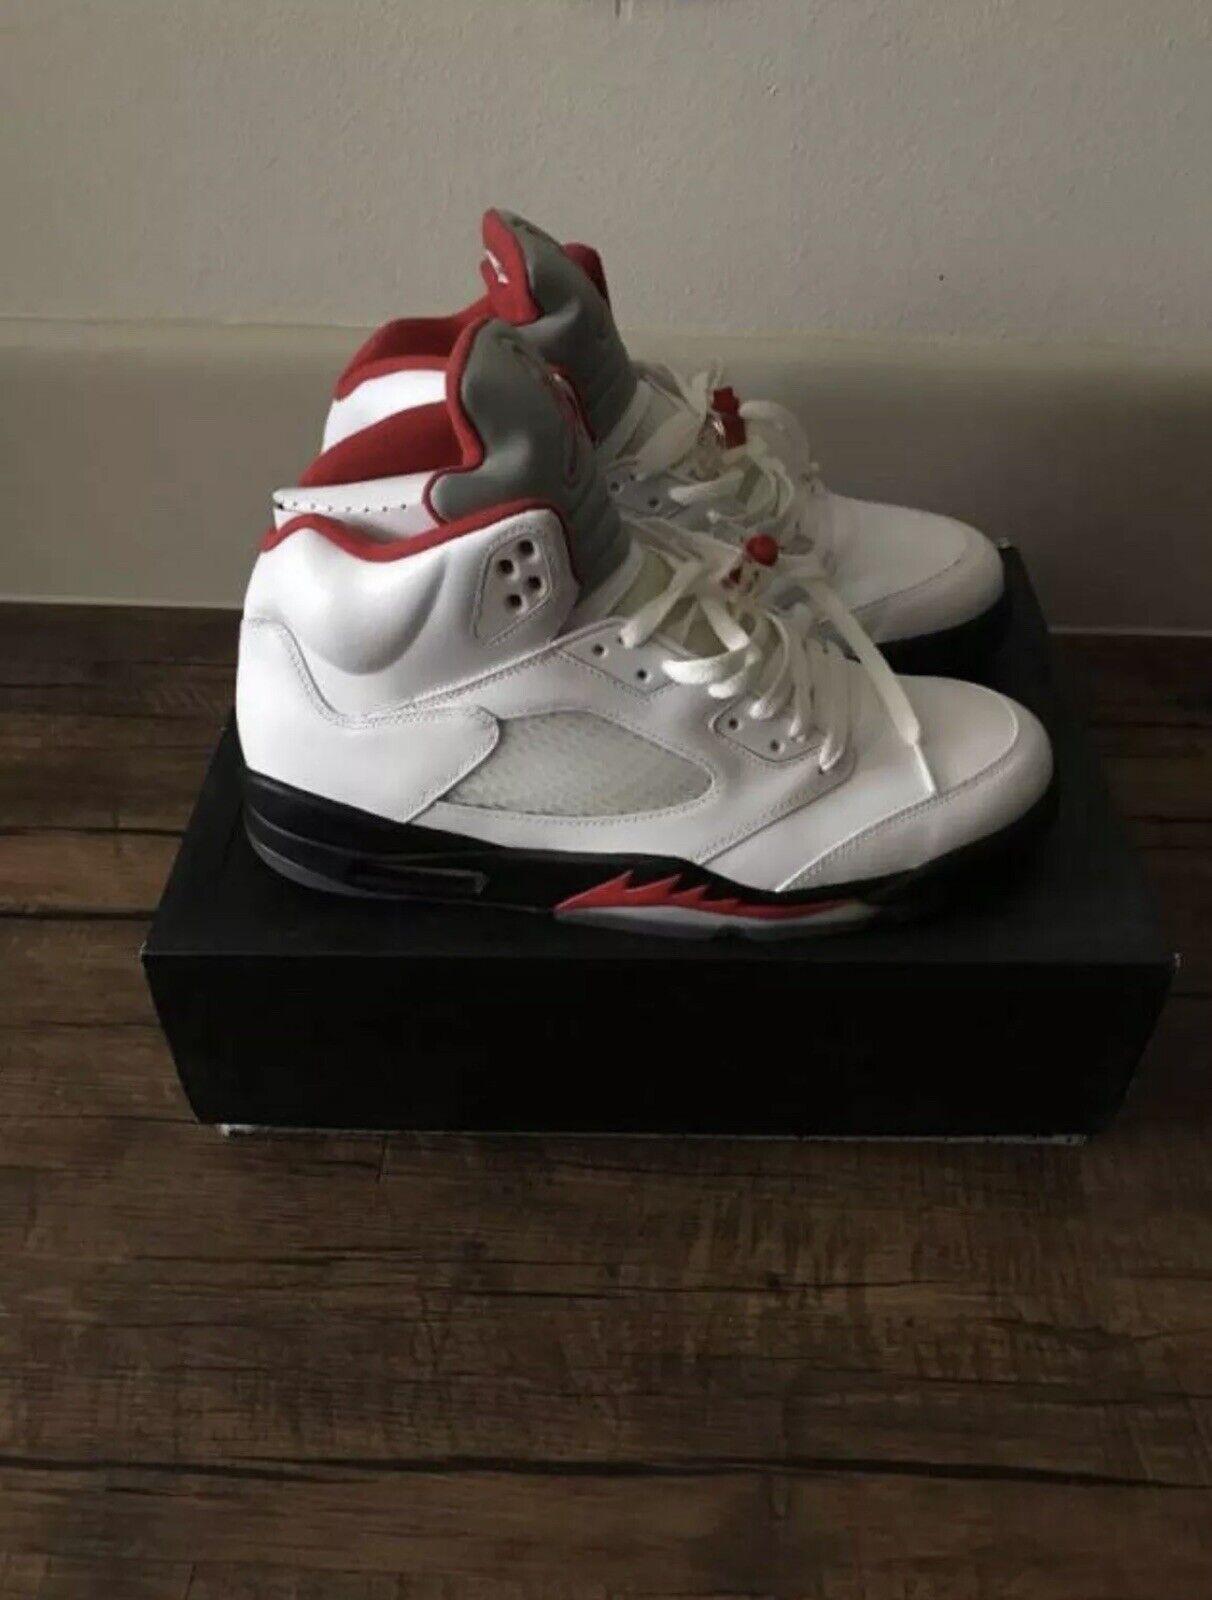 Jordan Retro 5 Fire Red Size 13